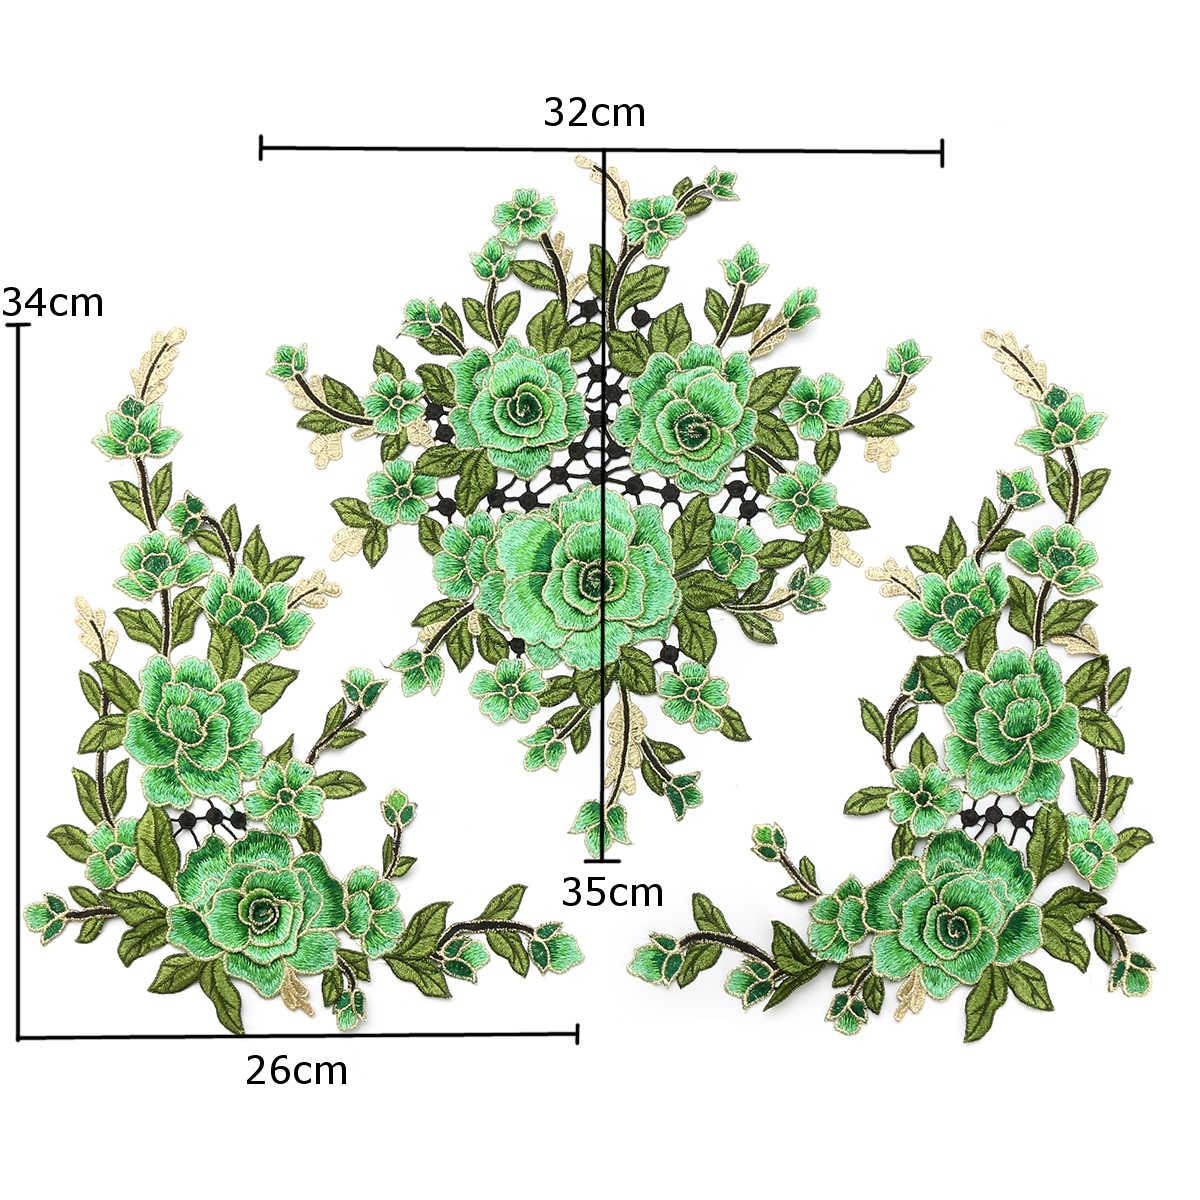 3 unids/set 3D Rosa Parches con bordados de flores pegatina Para La Ropa Parches Para La Ropa apliques bordados Parches Para Cheongsam